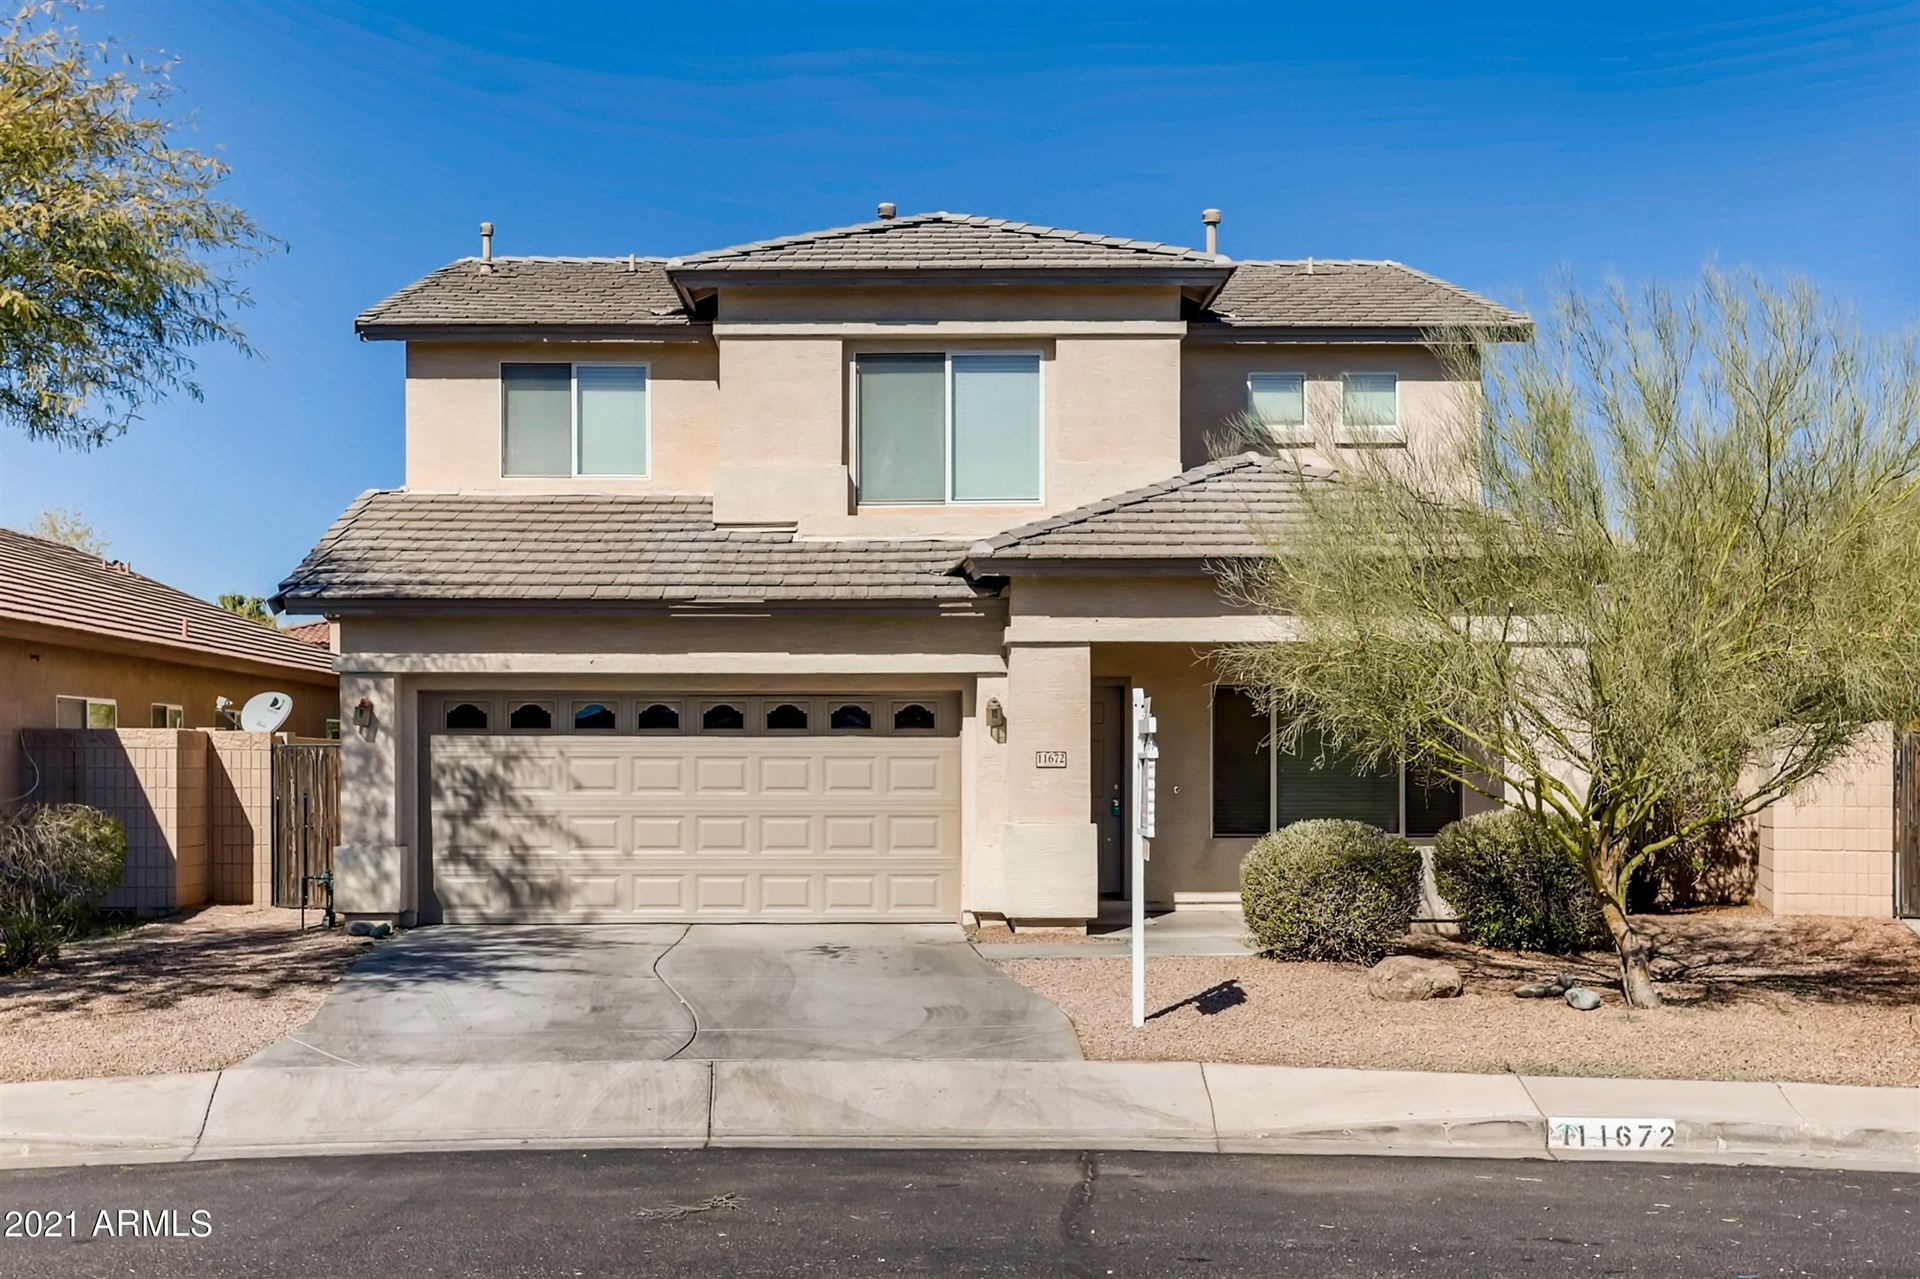 Photo of 11672 W MONROE Street, Avondale, AZ 85323 (MLS # 6197731)